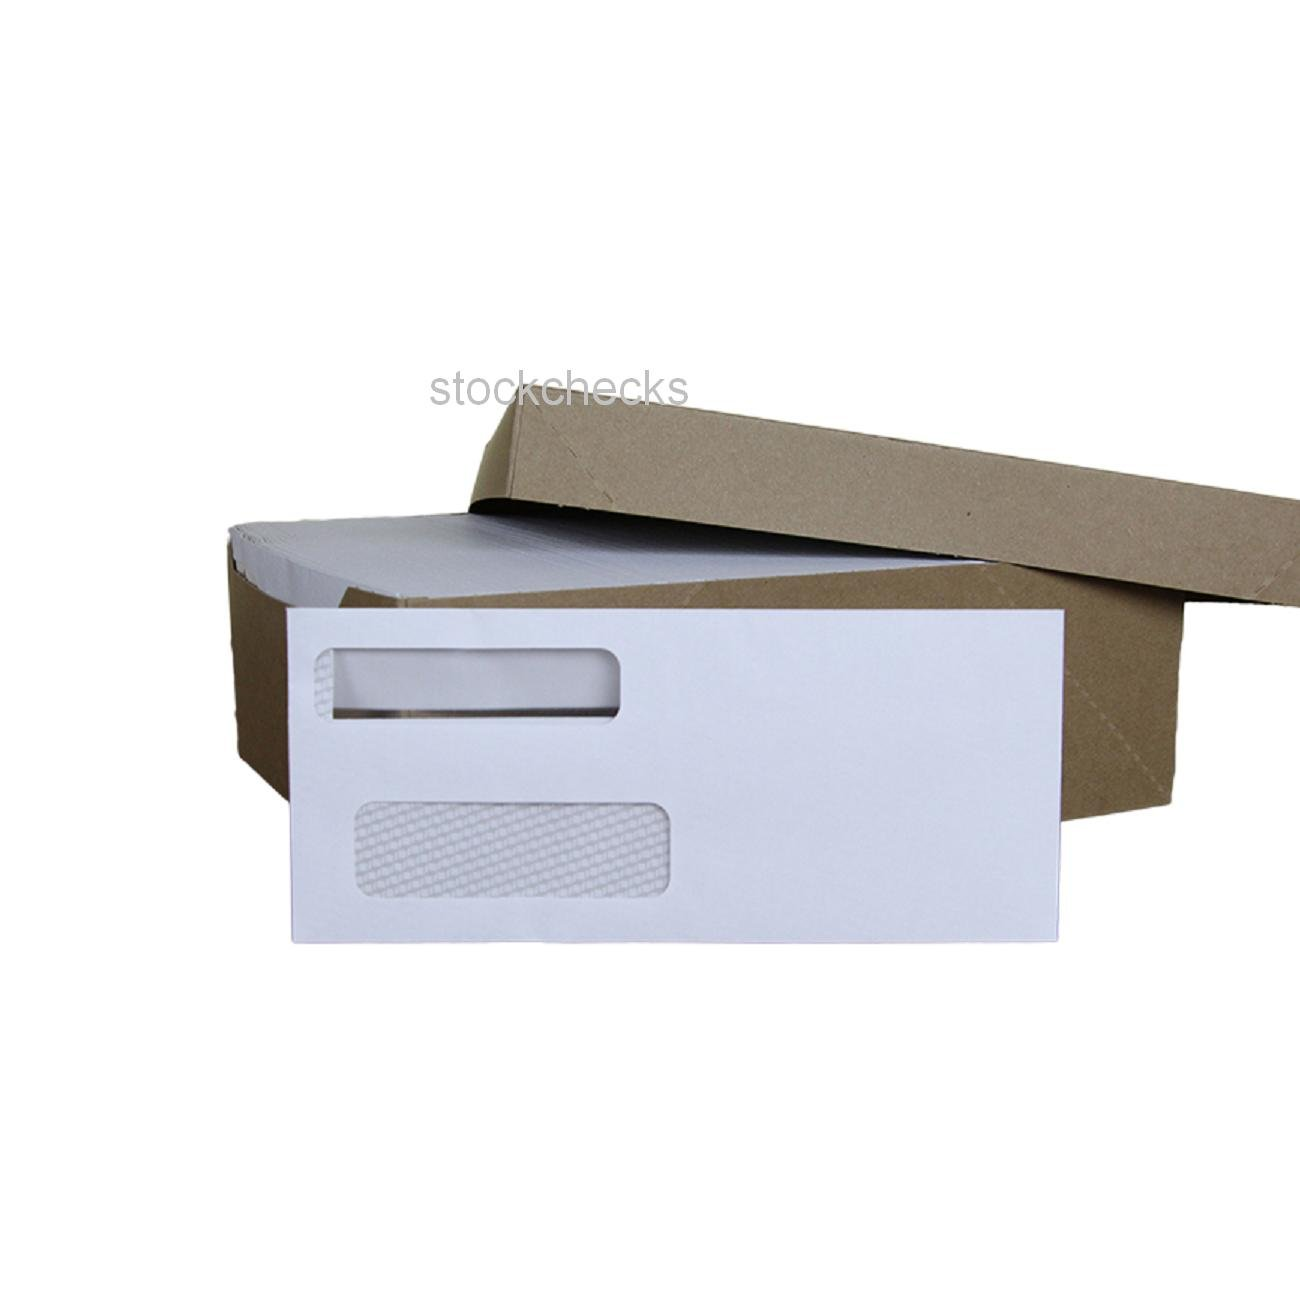 Microsoft Money Checks Tint Self Seal Envelopes: Fits Quicken Quickbooks Quick Books 500ct #9 Double Window Security Intuit